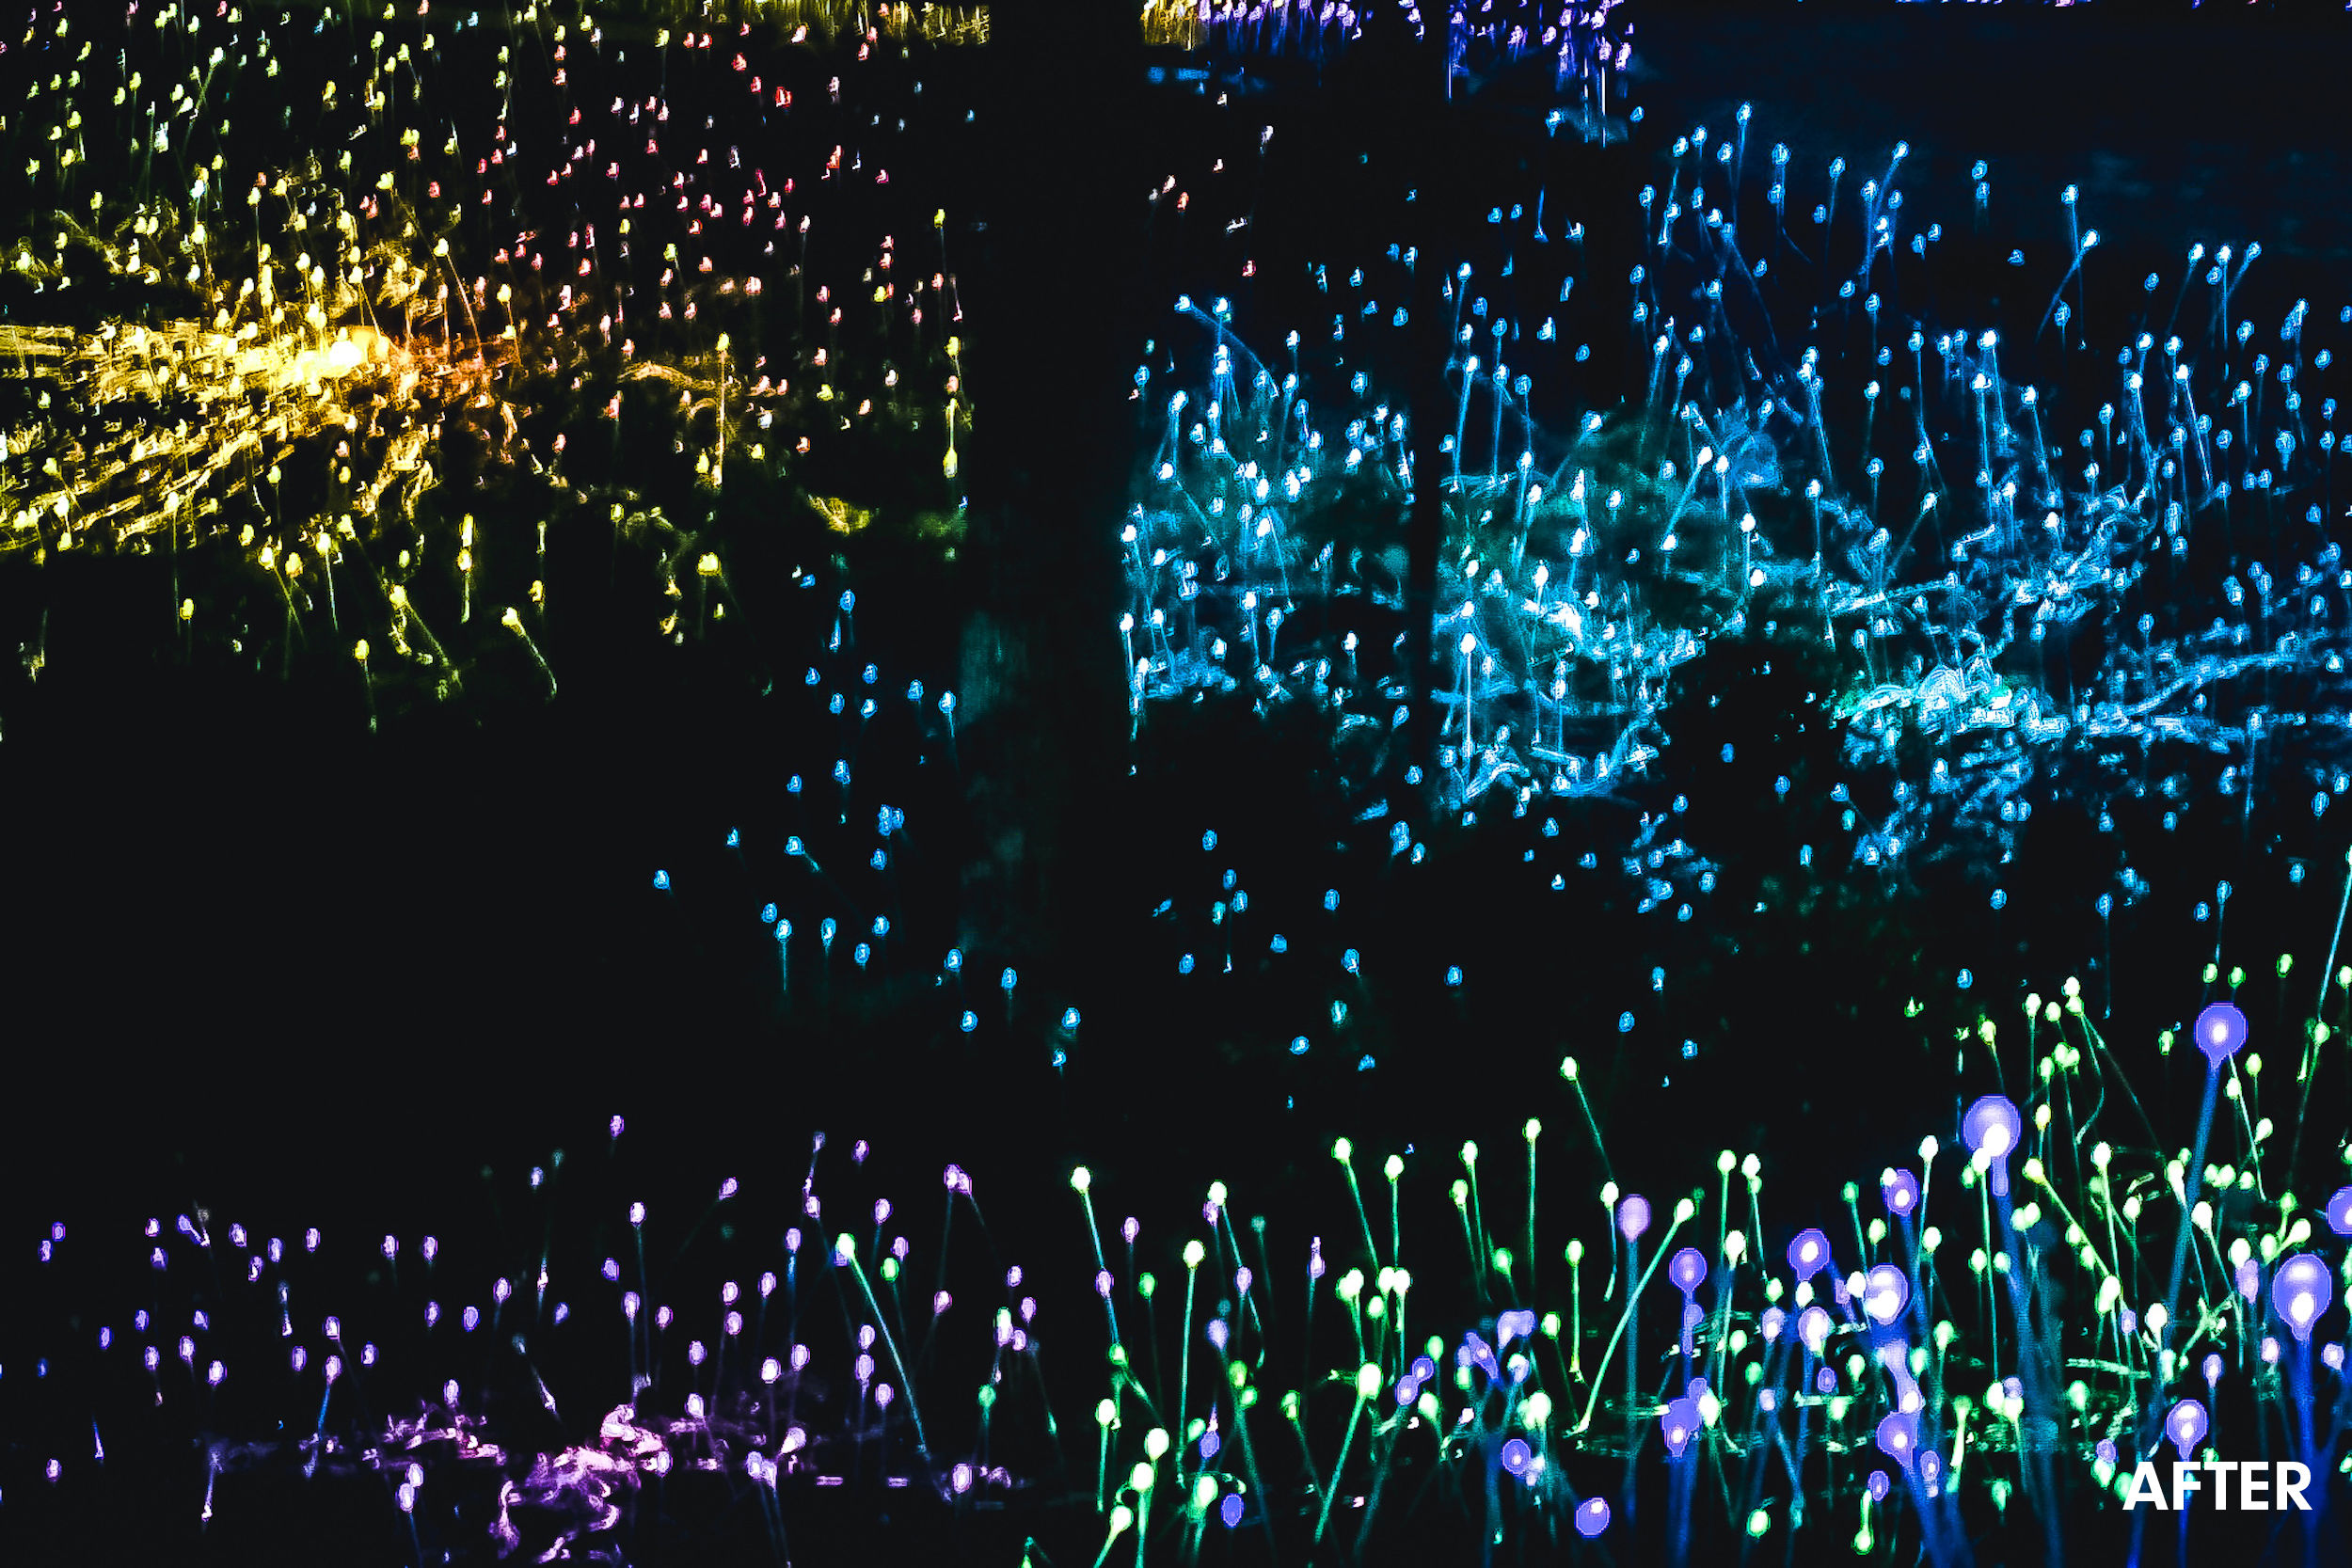 glowforest-atlantachickpeach-lightroom-presets6.jpg